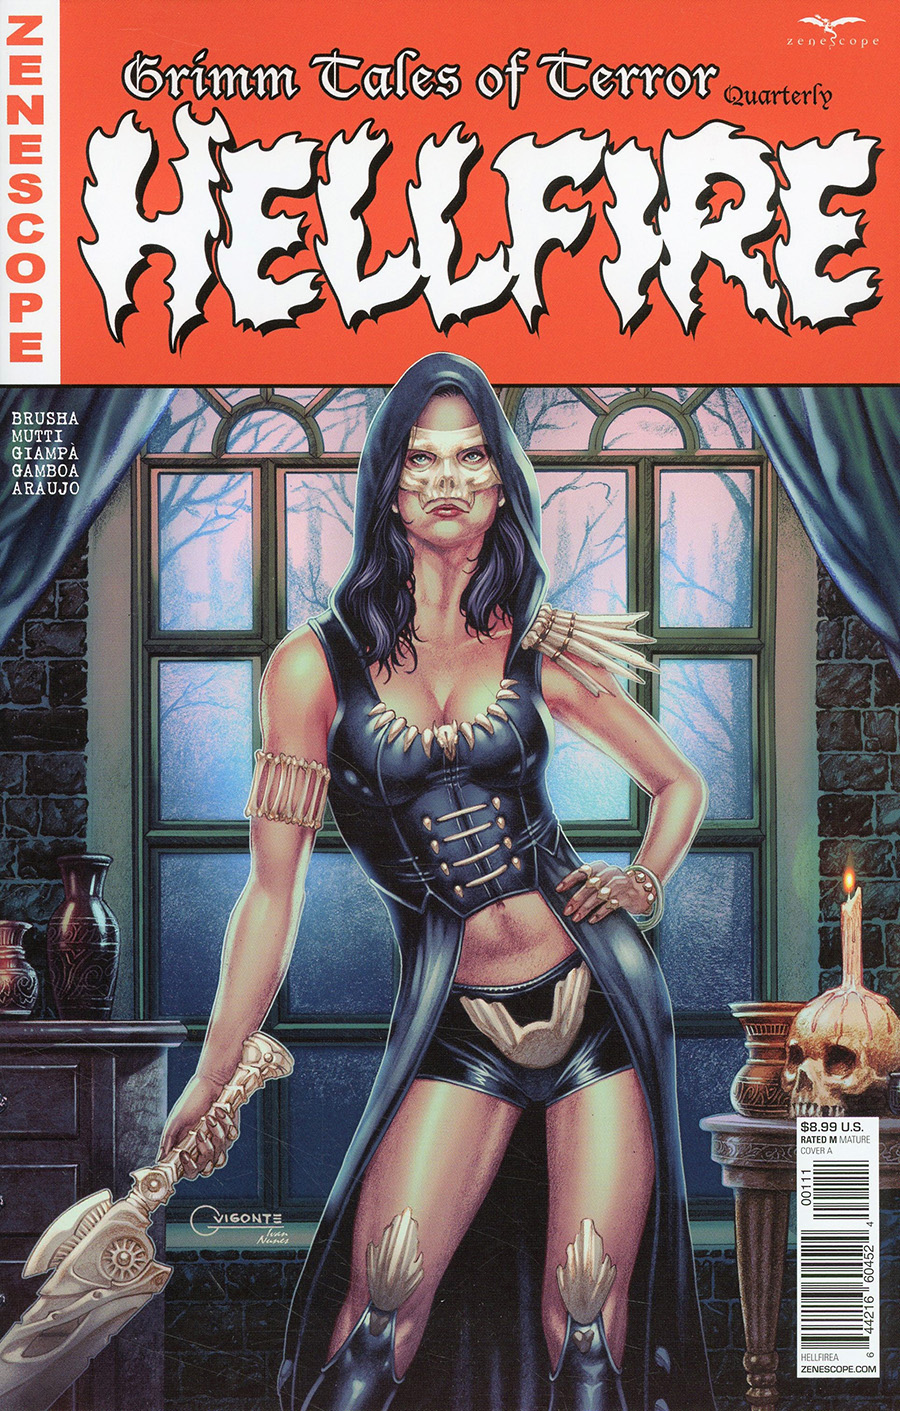 Grimm Fairy Tales Presents Grimm Tales Of Terror Quarterly #1 Hellfire Cover A Geebo Vigonte